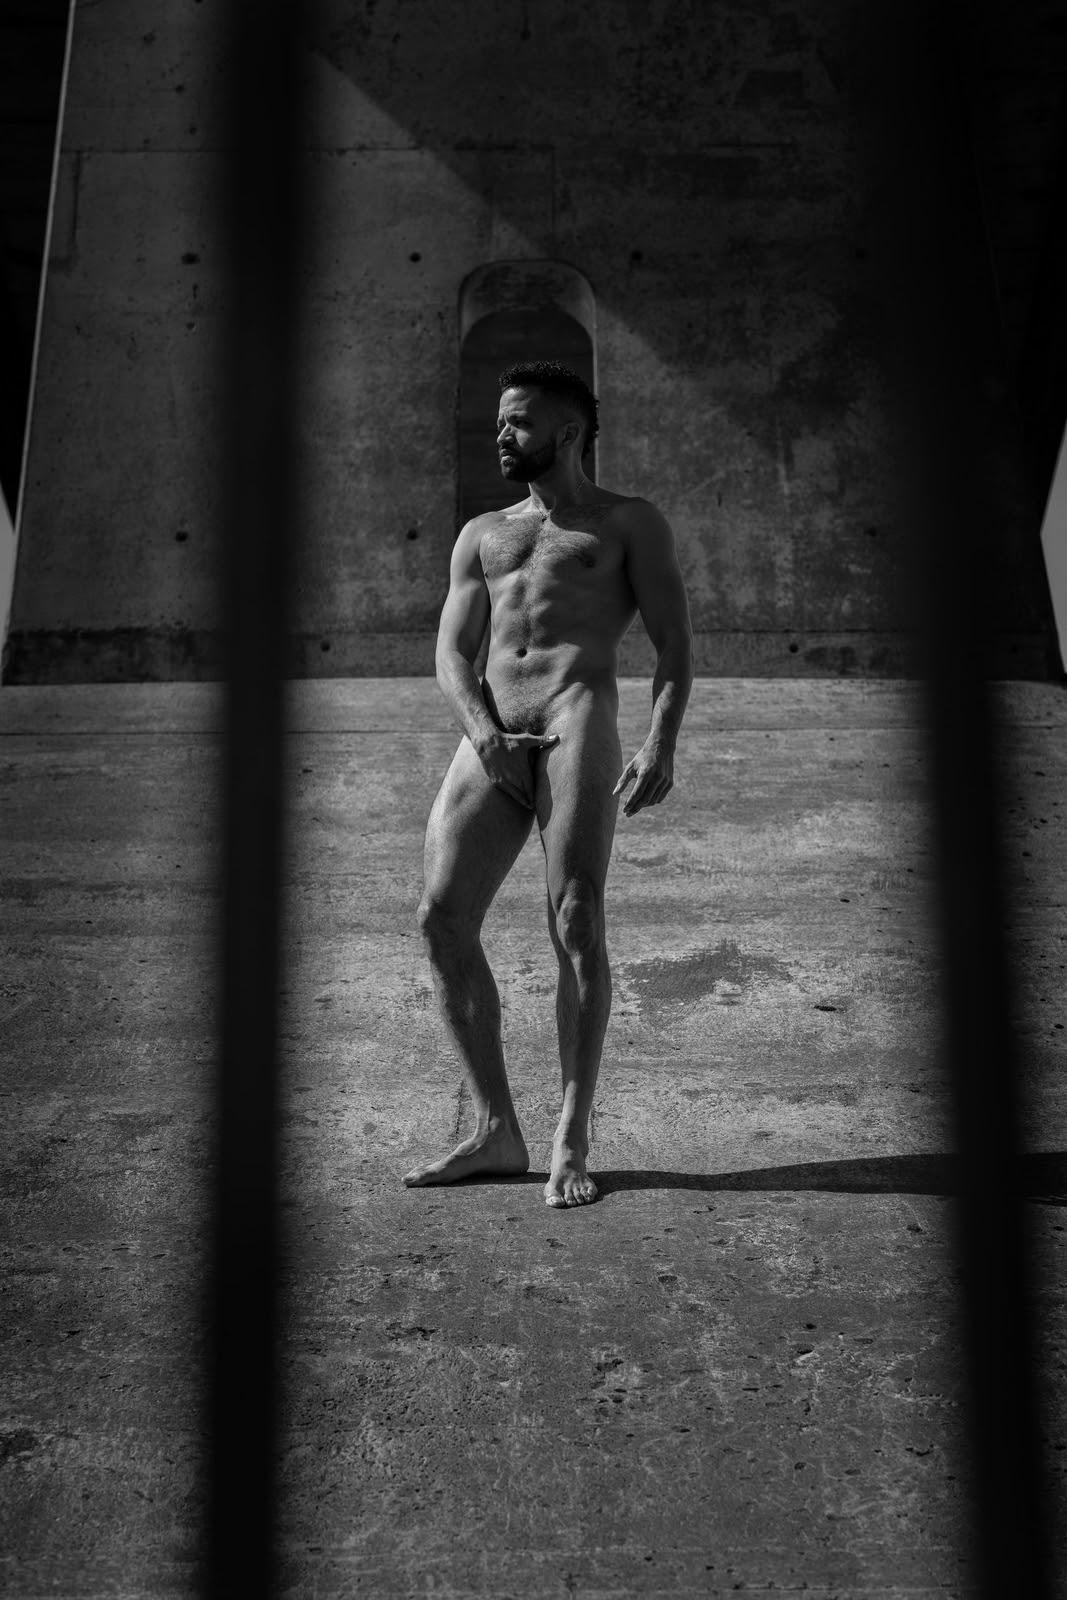 LighT, by The Nude Yorker aka Franklin Liranzo (NSFW).